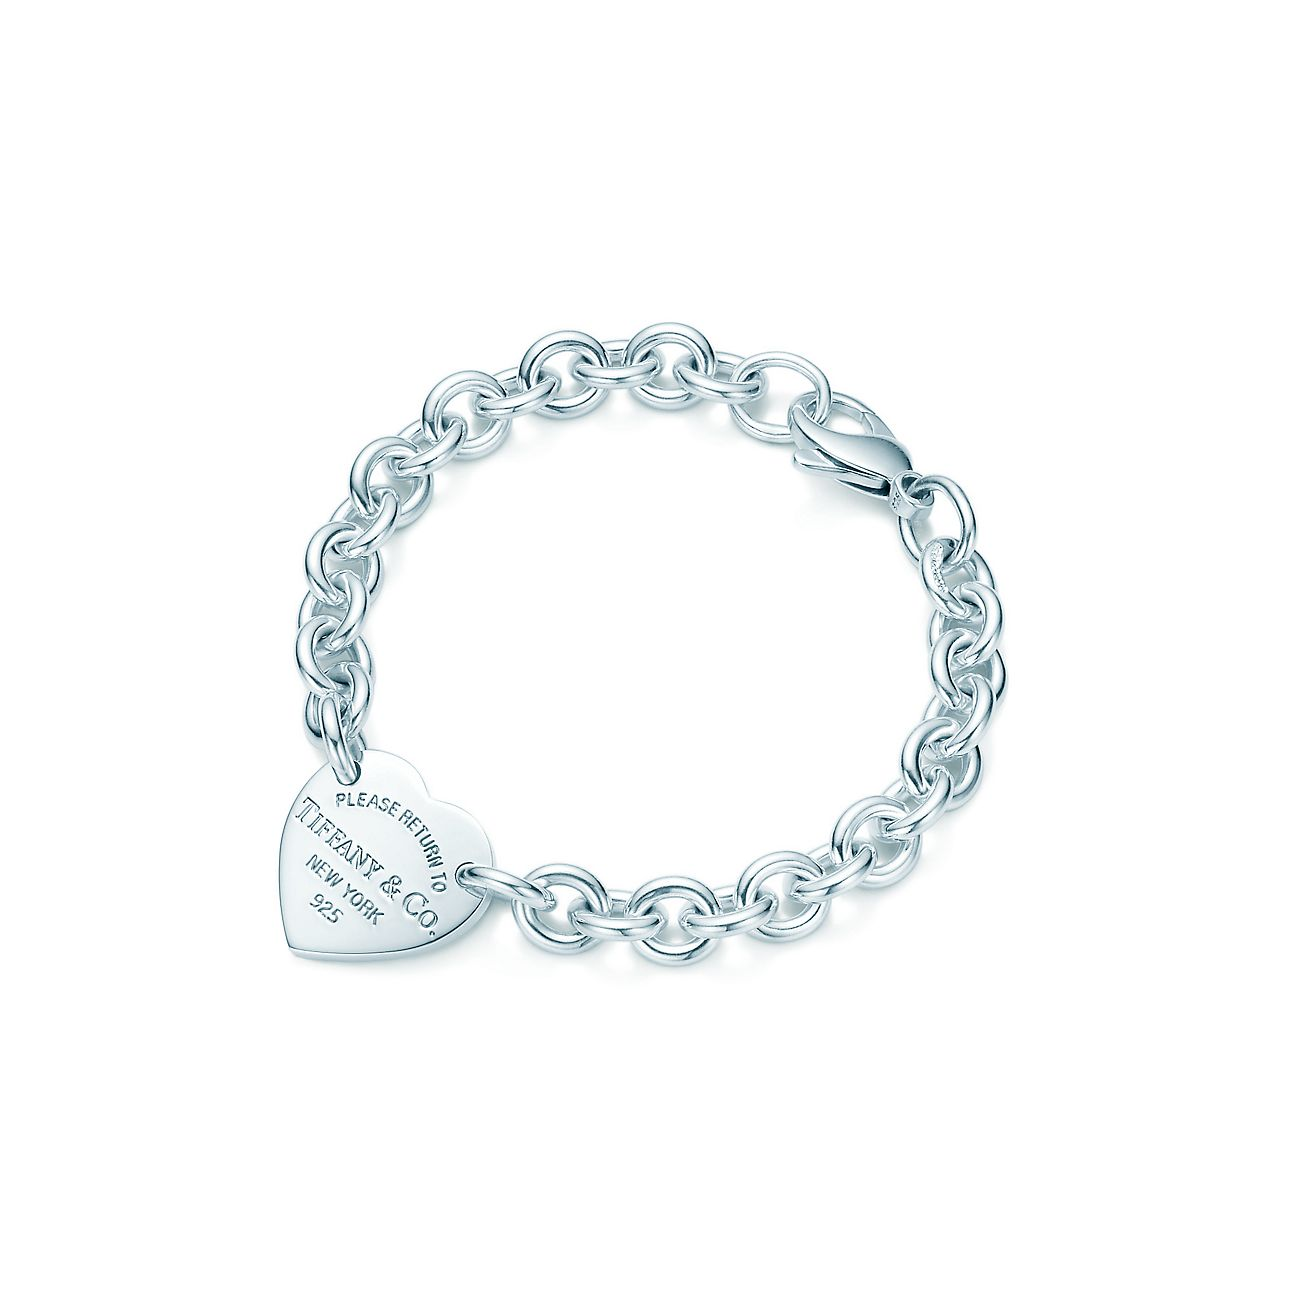 Return to Tiffany medium heart tag on a bracelet in sterling silver, medium - Size 7.5 IN Tiffany & Co.